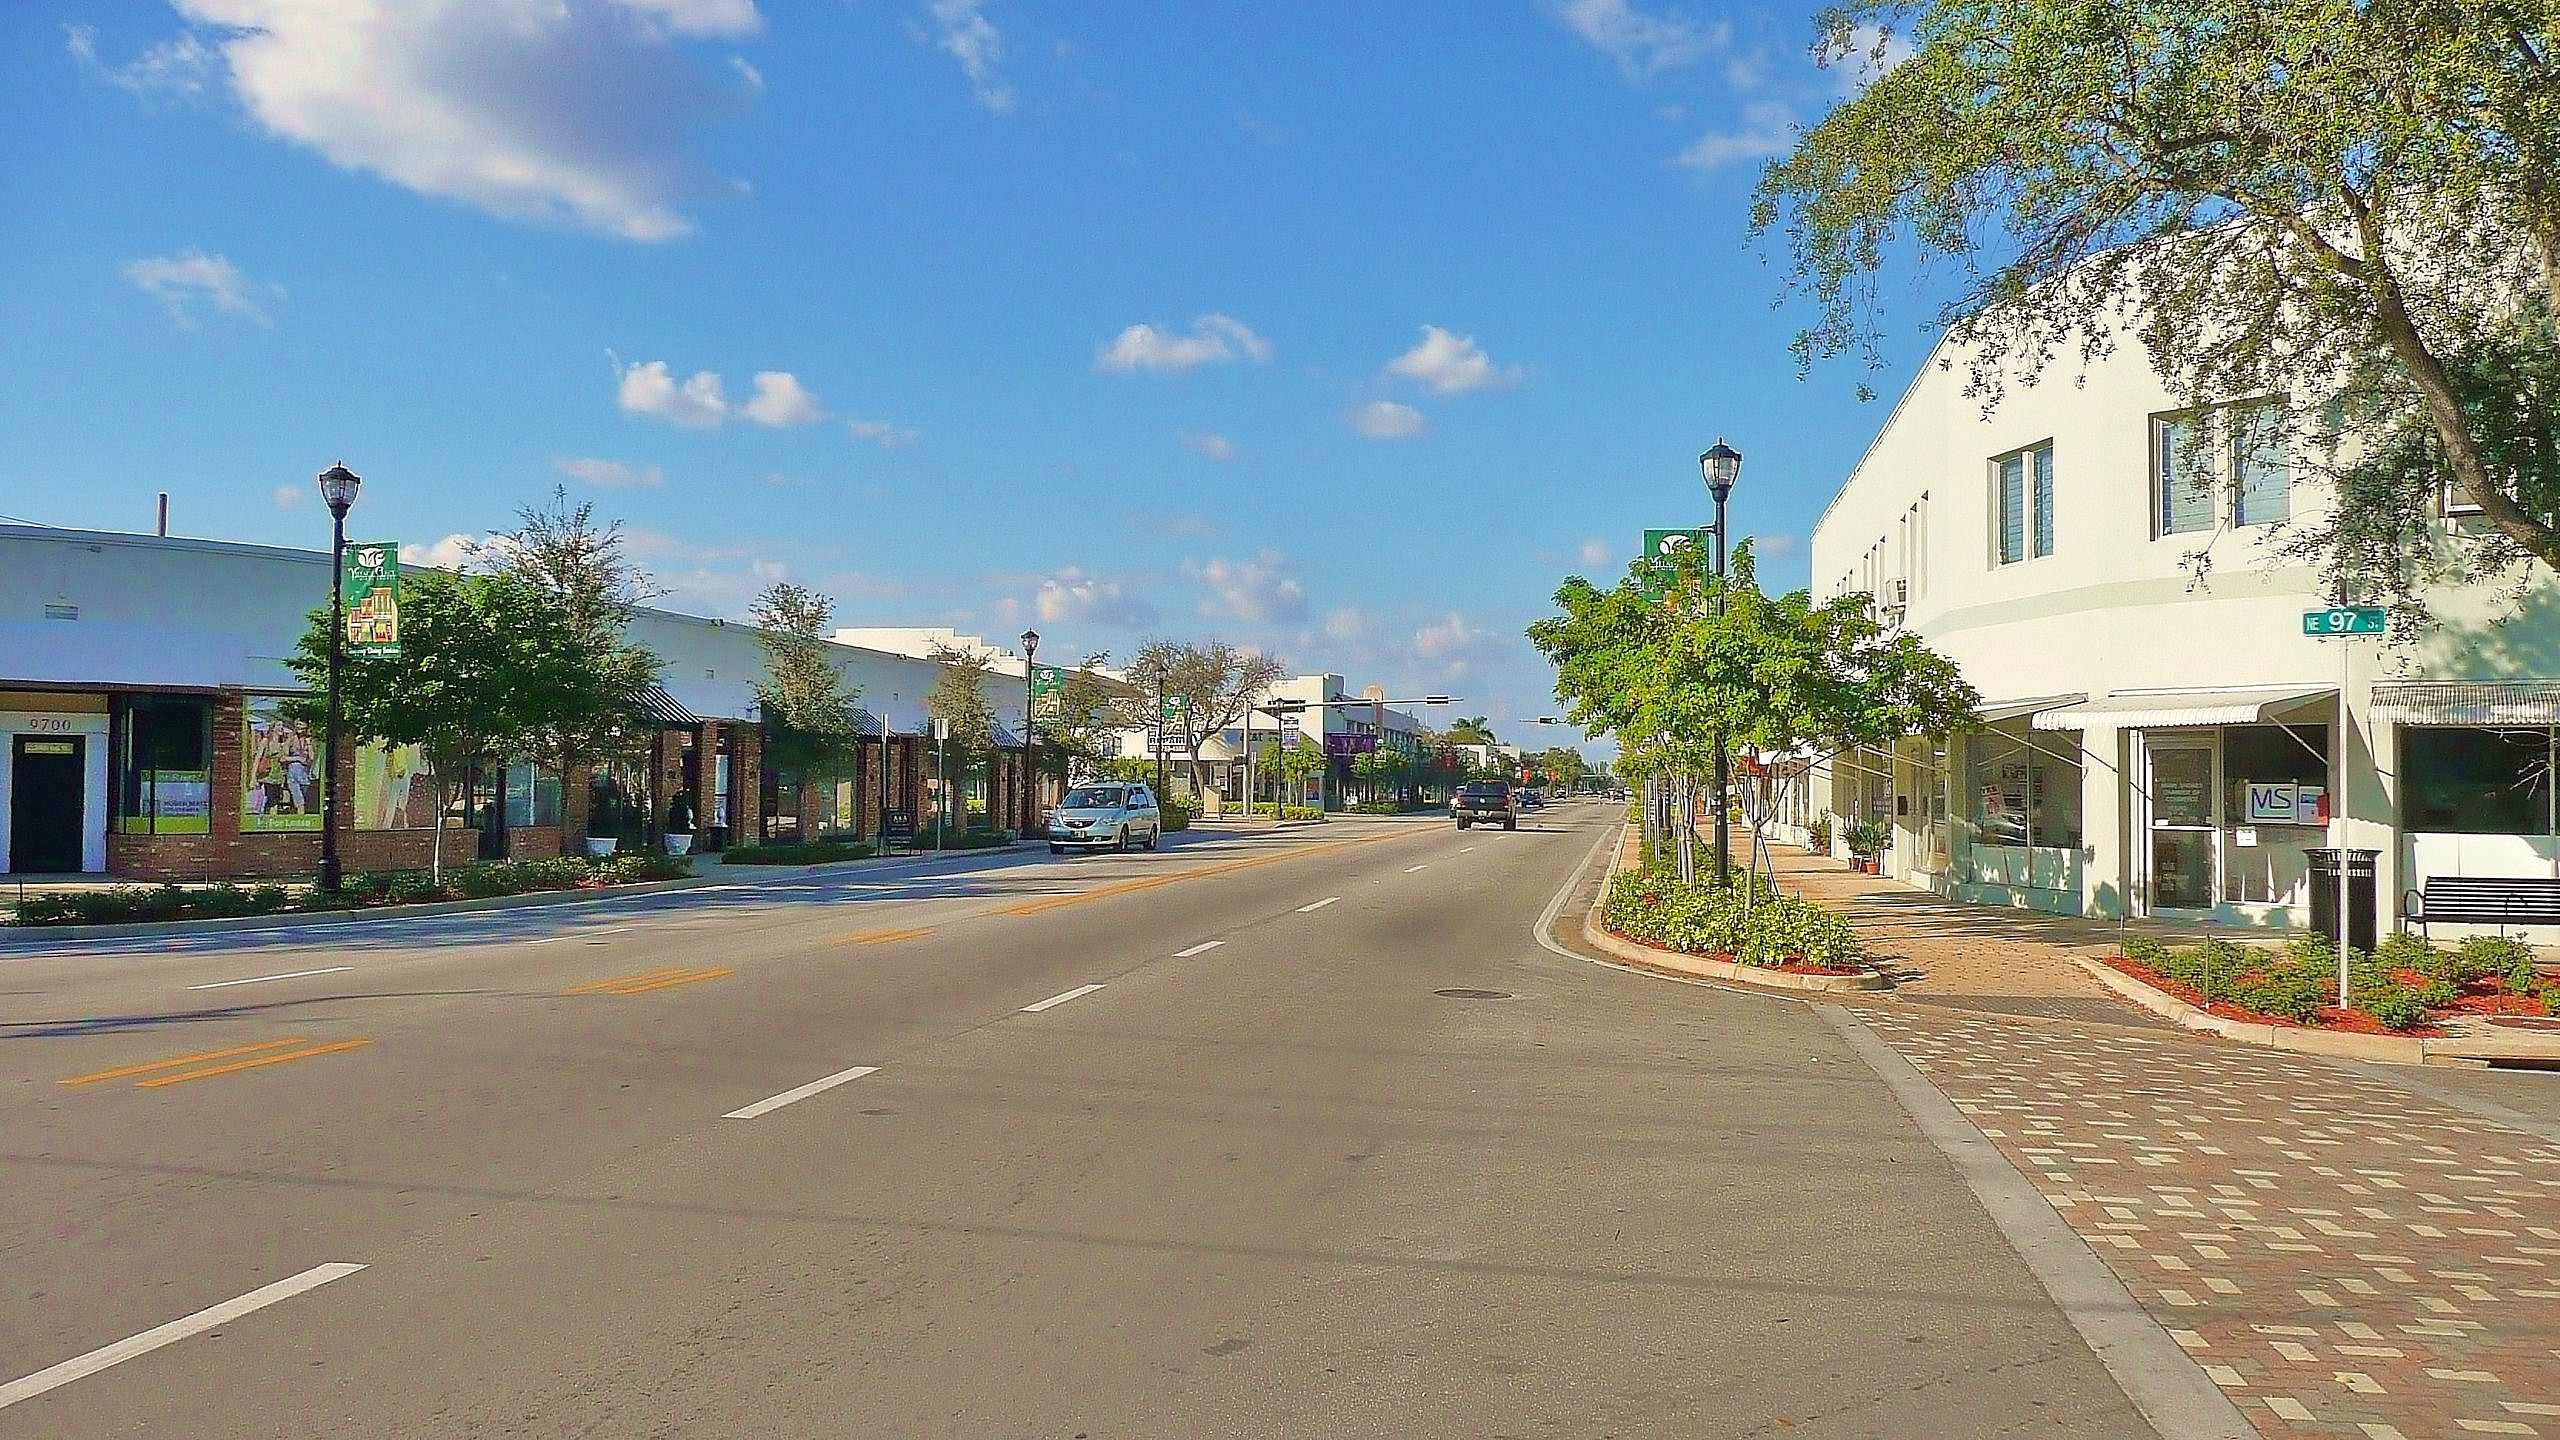 Downtown area of Miami Shores, Fla. Credit: Marc Averette via Wikimedia Commons.